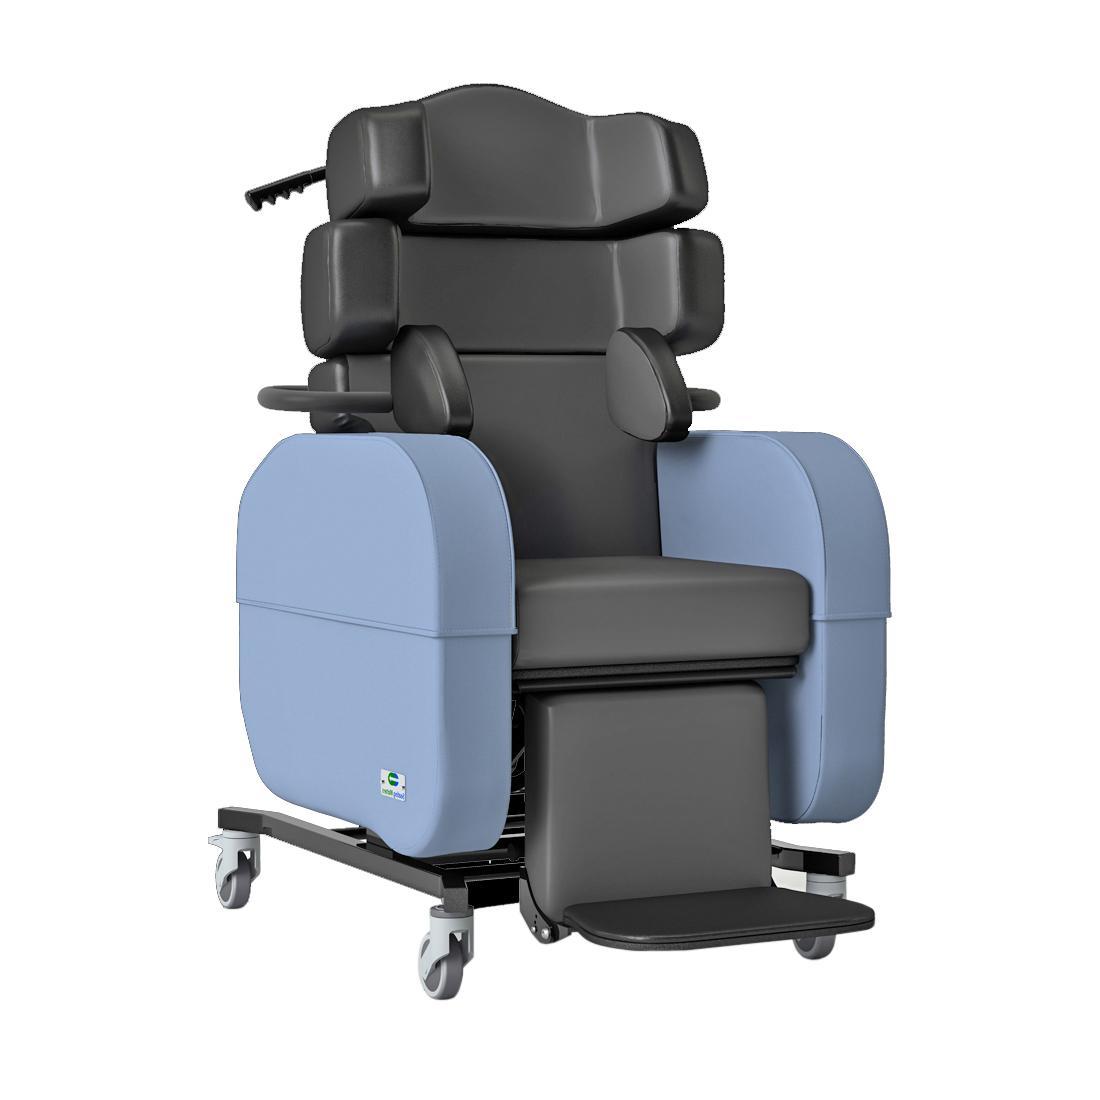 Seating Matters Phoenix therapeutic seating